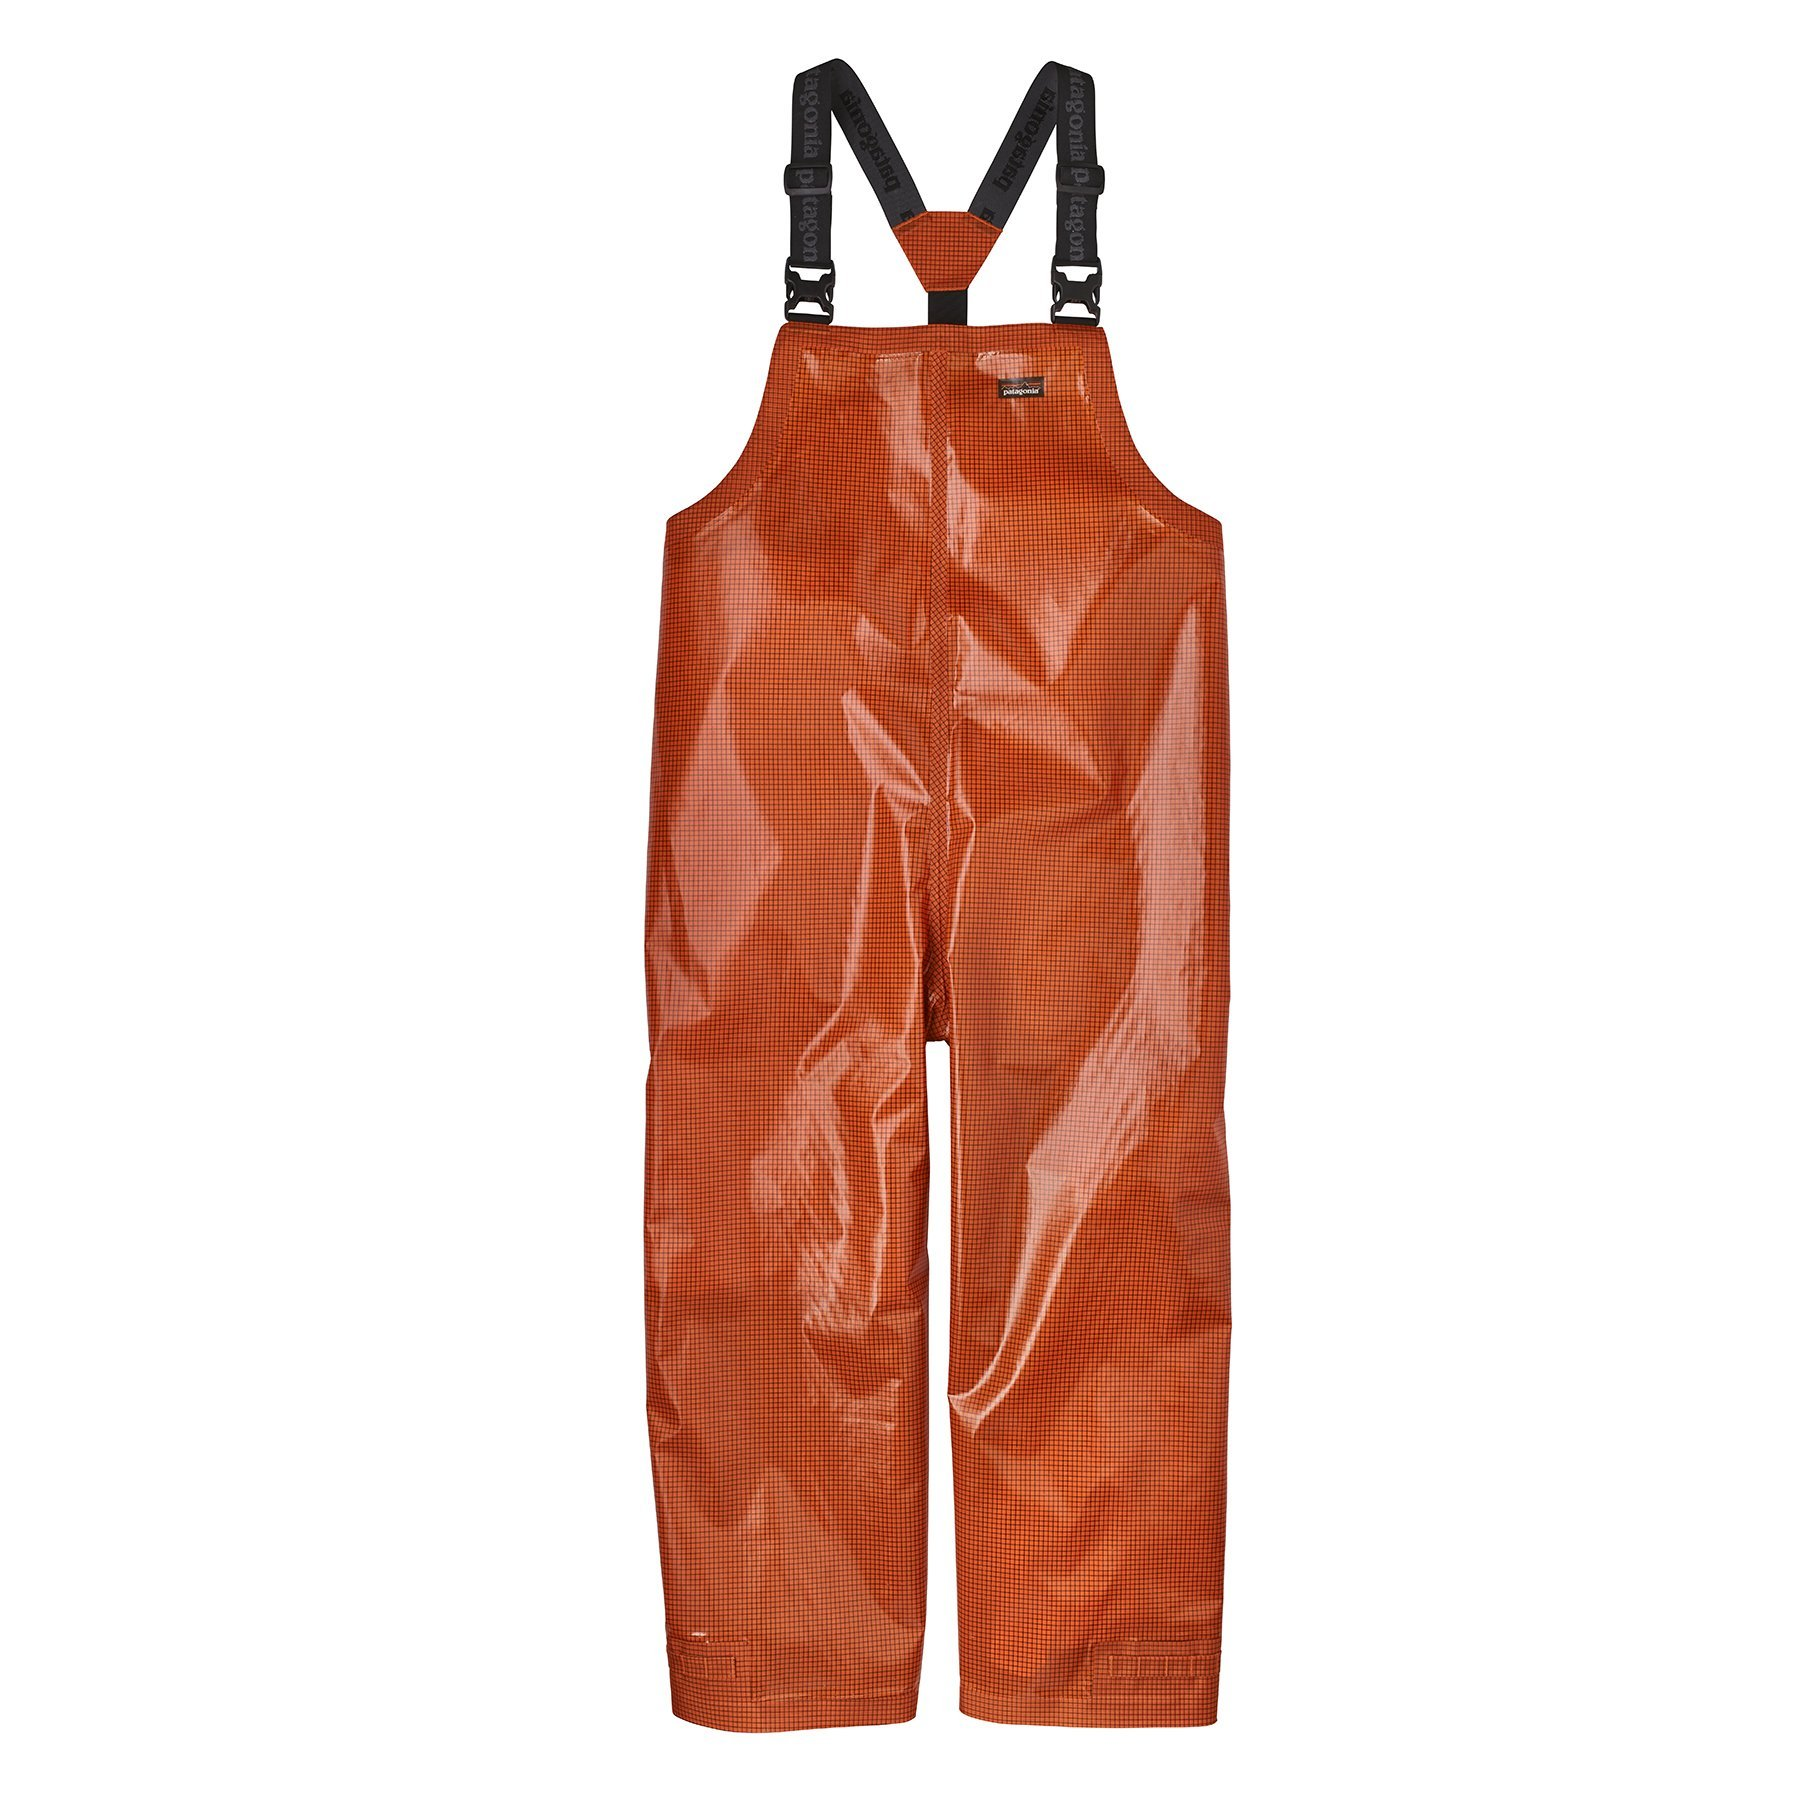 Men's Hose-Down Slicker Bib Overalls